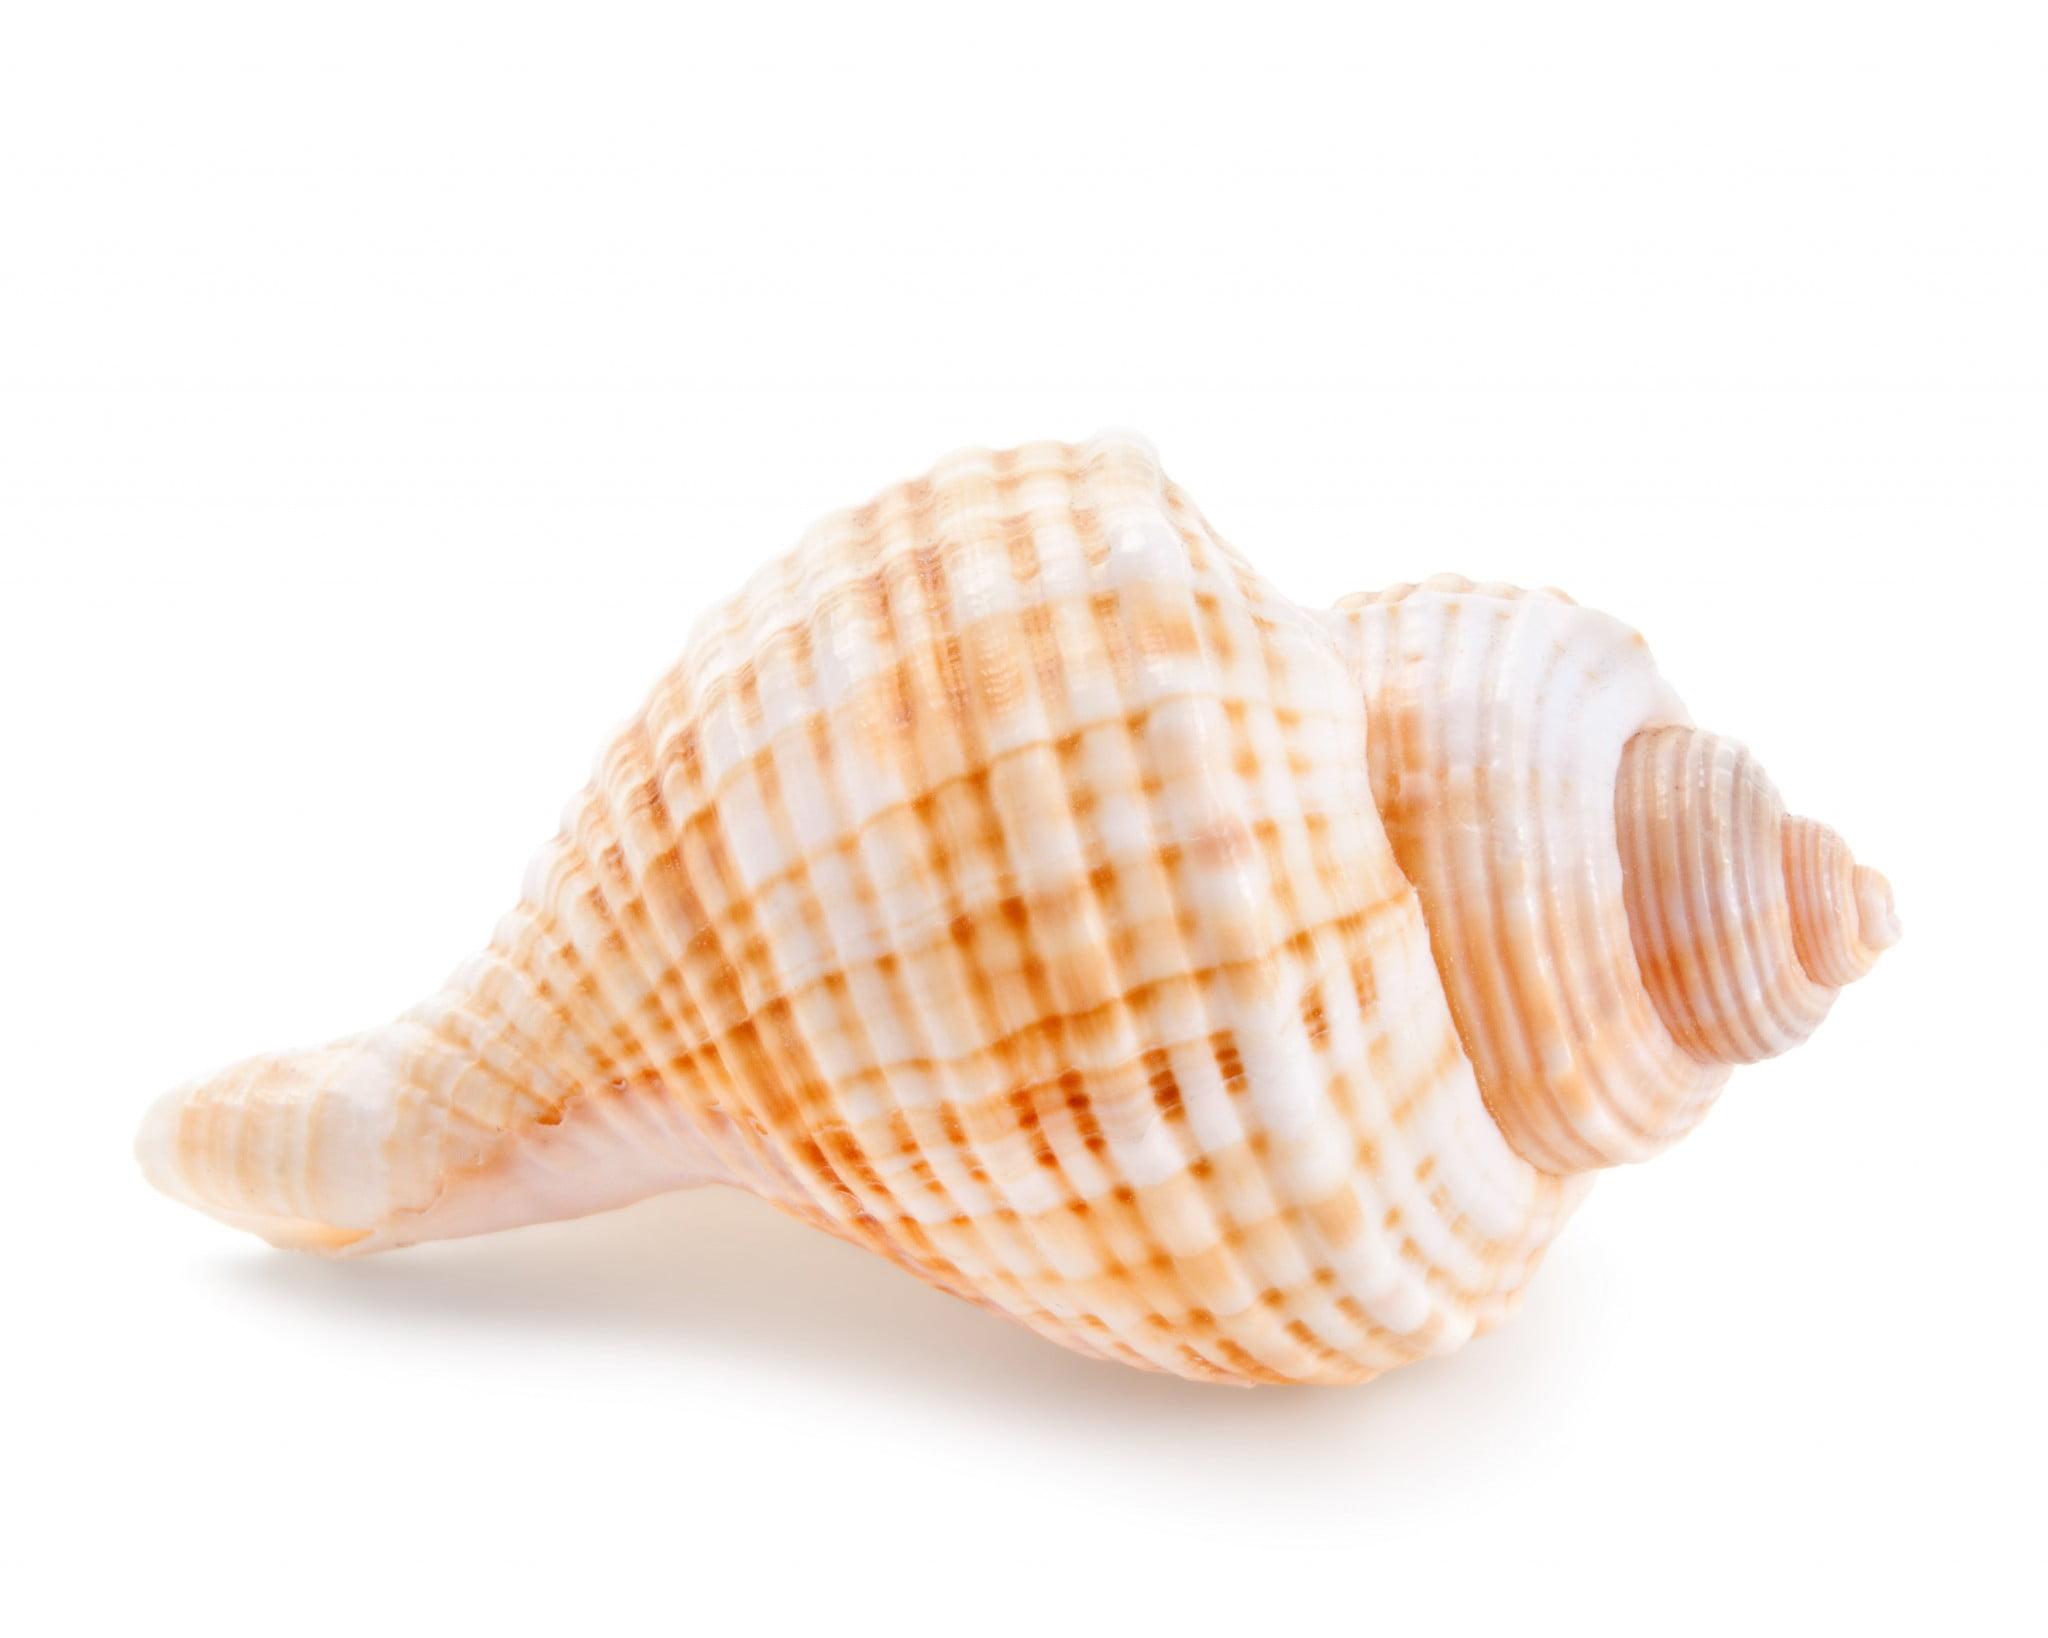 seashell-inspired capsule - pretty seashell